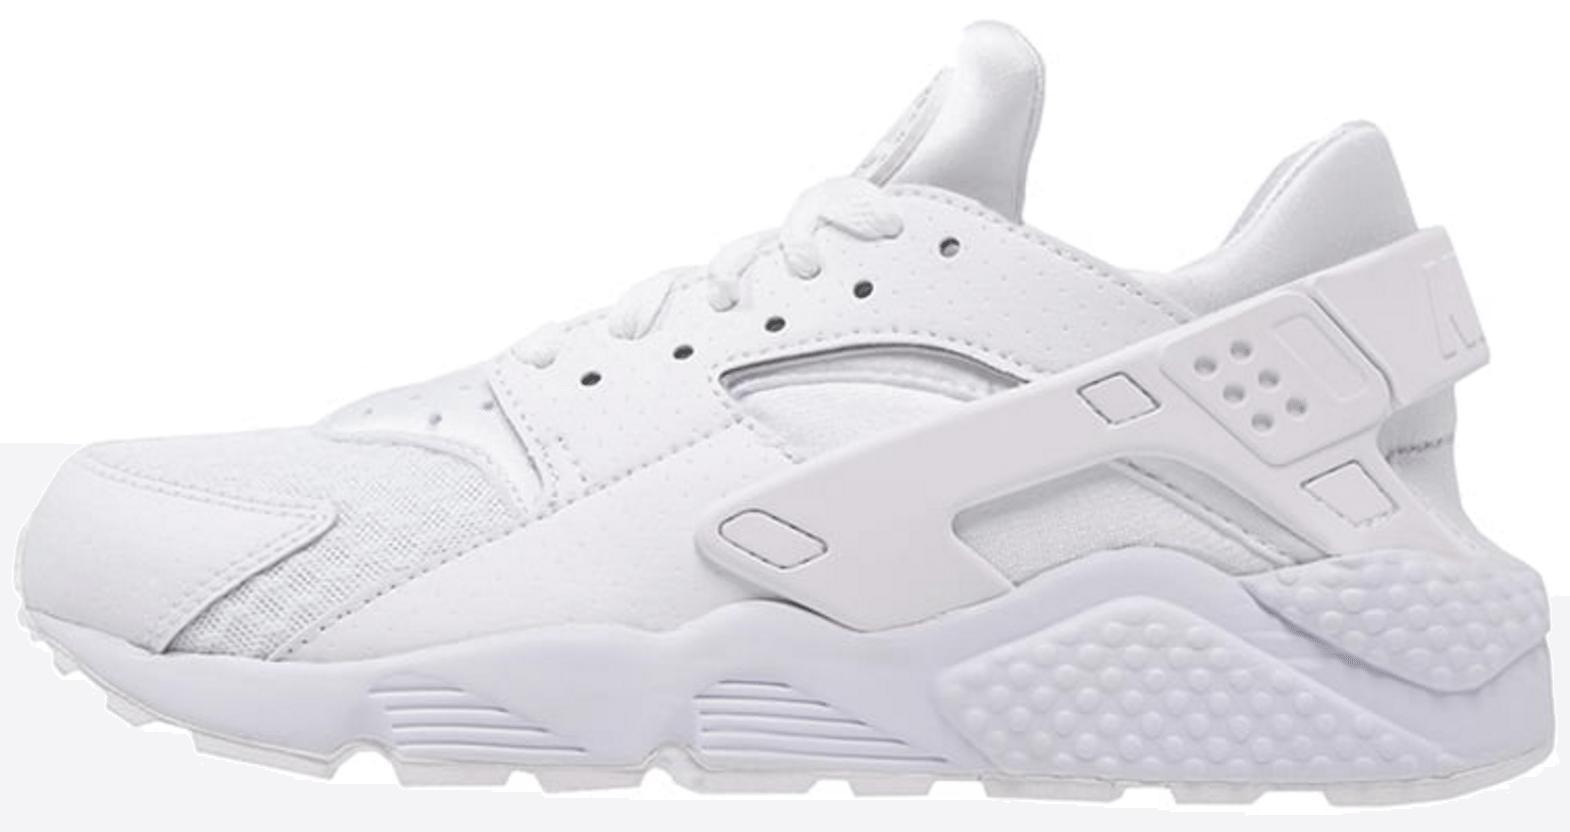 hvide nike air huarache sneakers Stay Classy